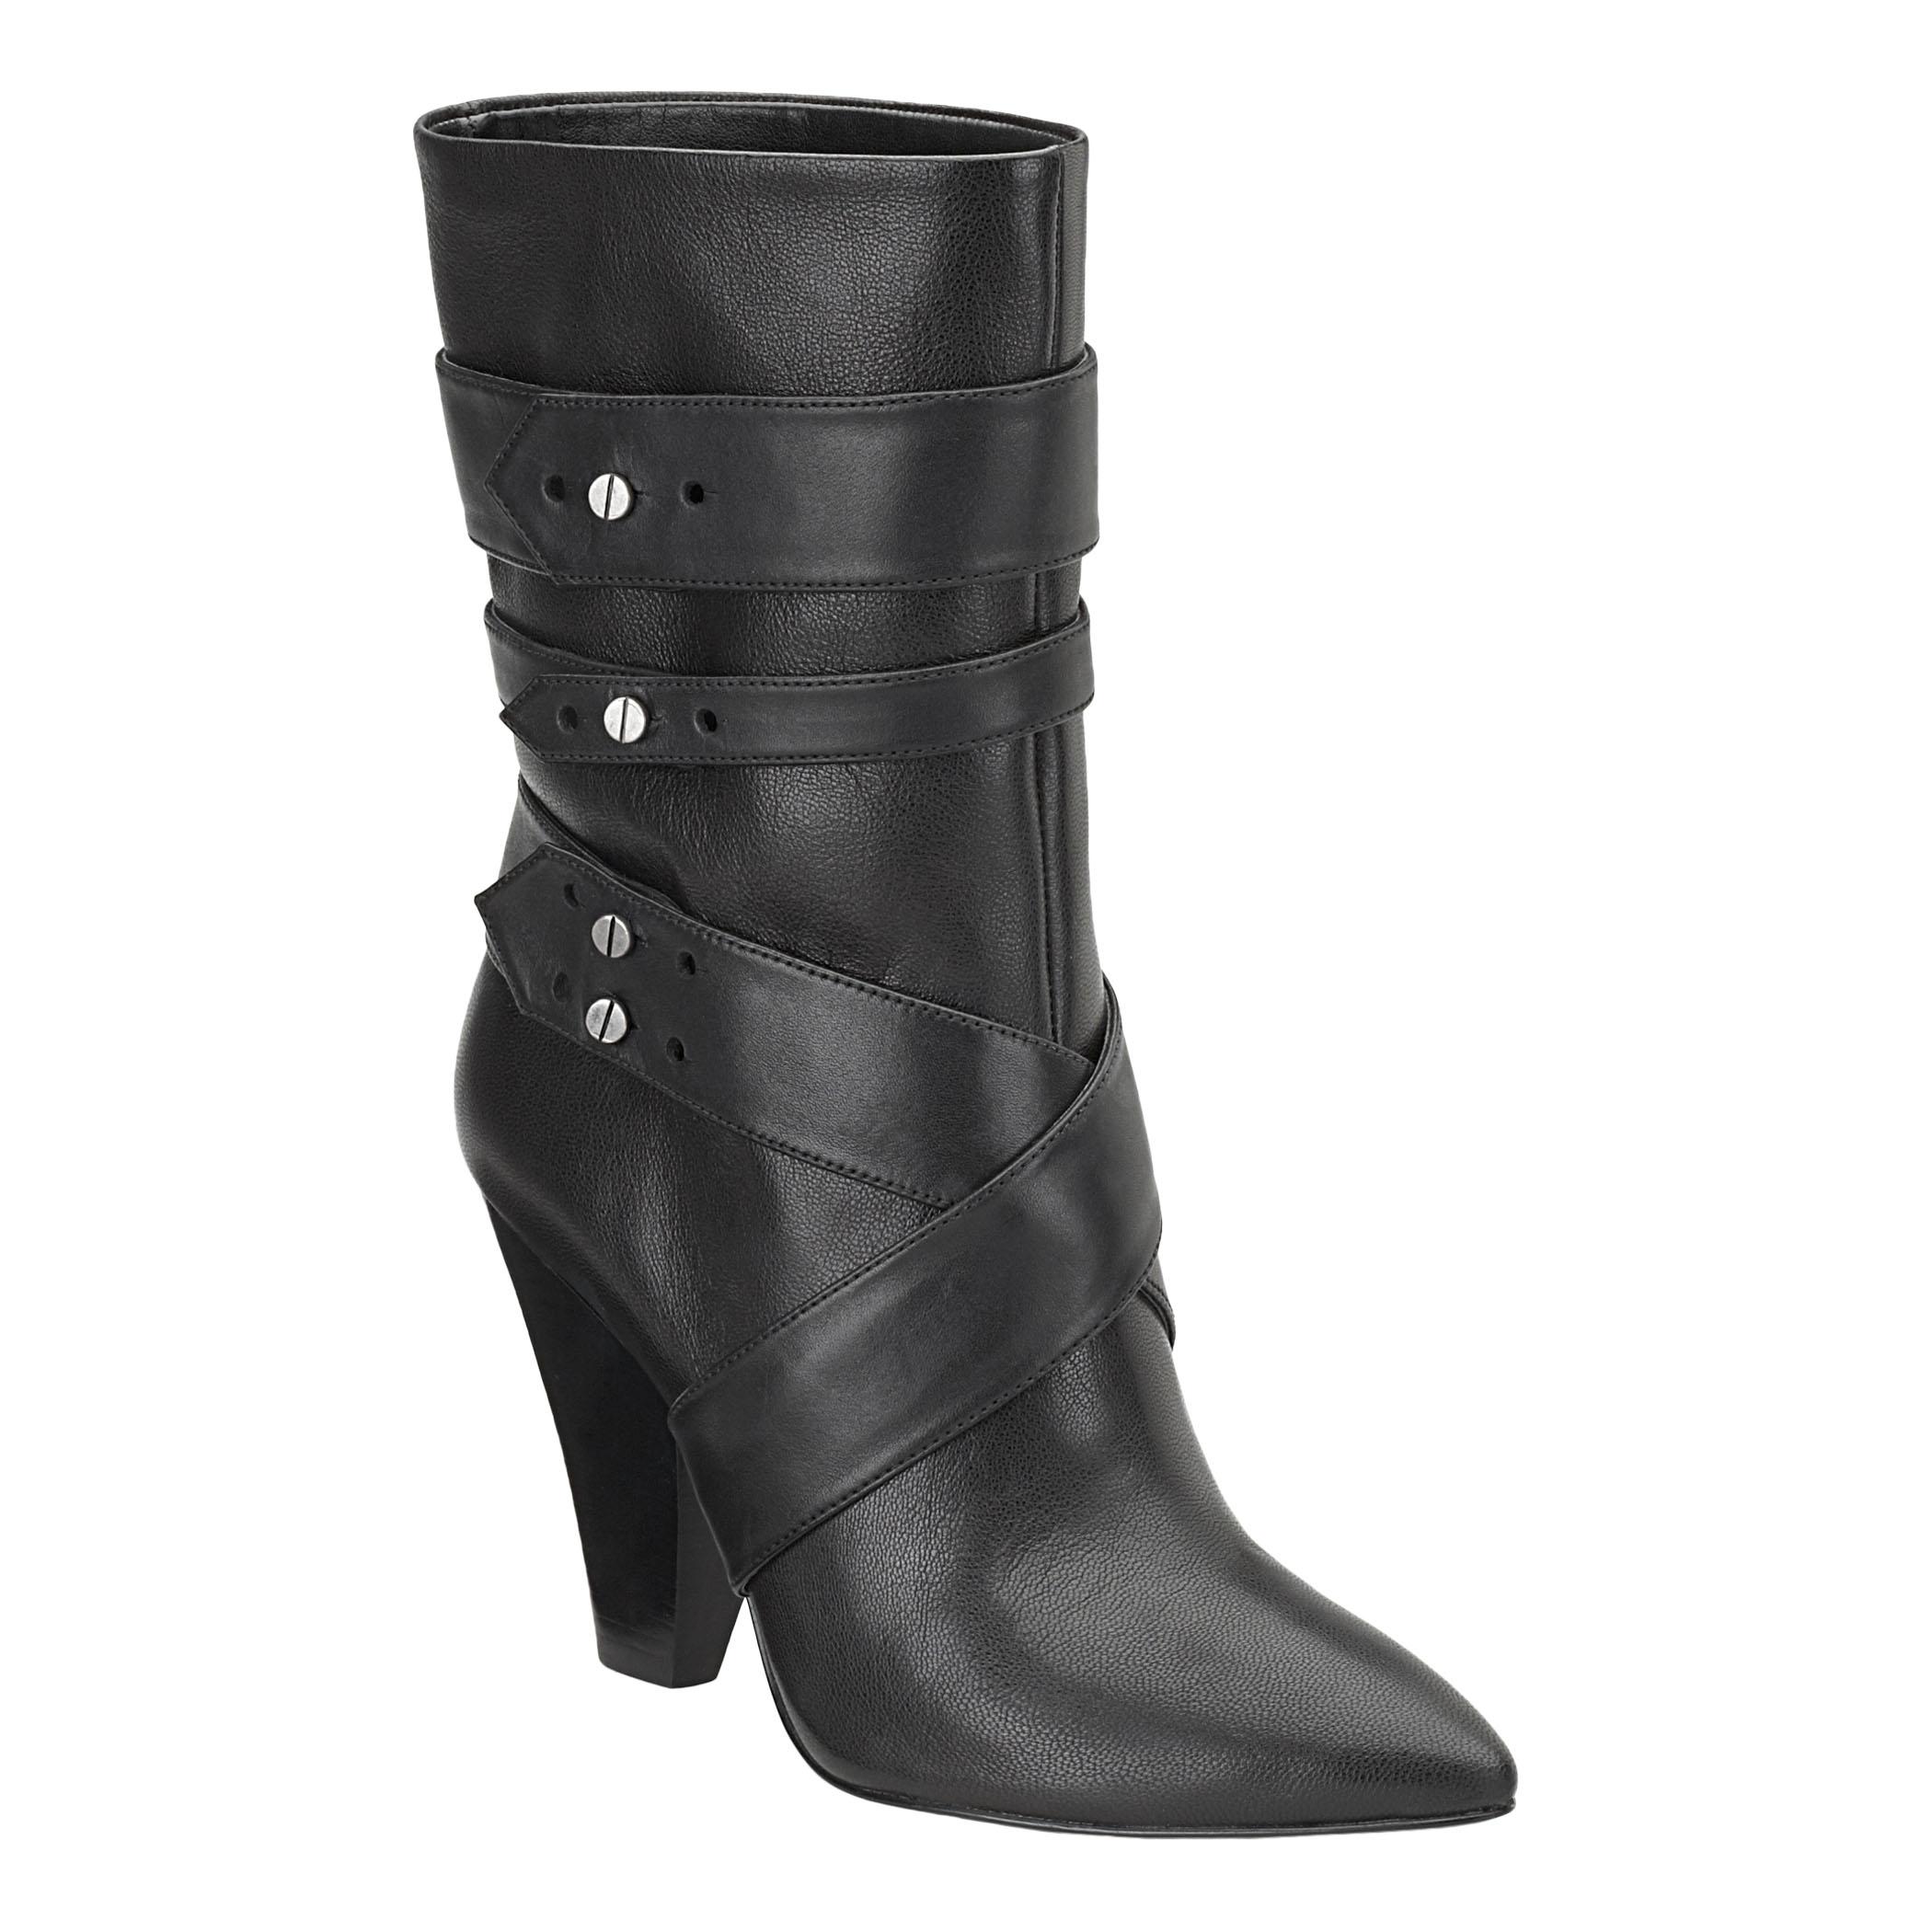 Nine West: Shoes > All Booties > TESORO BOOTIES  - BOOTIES